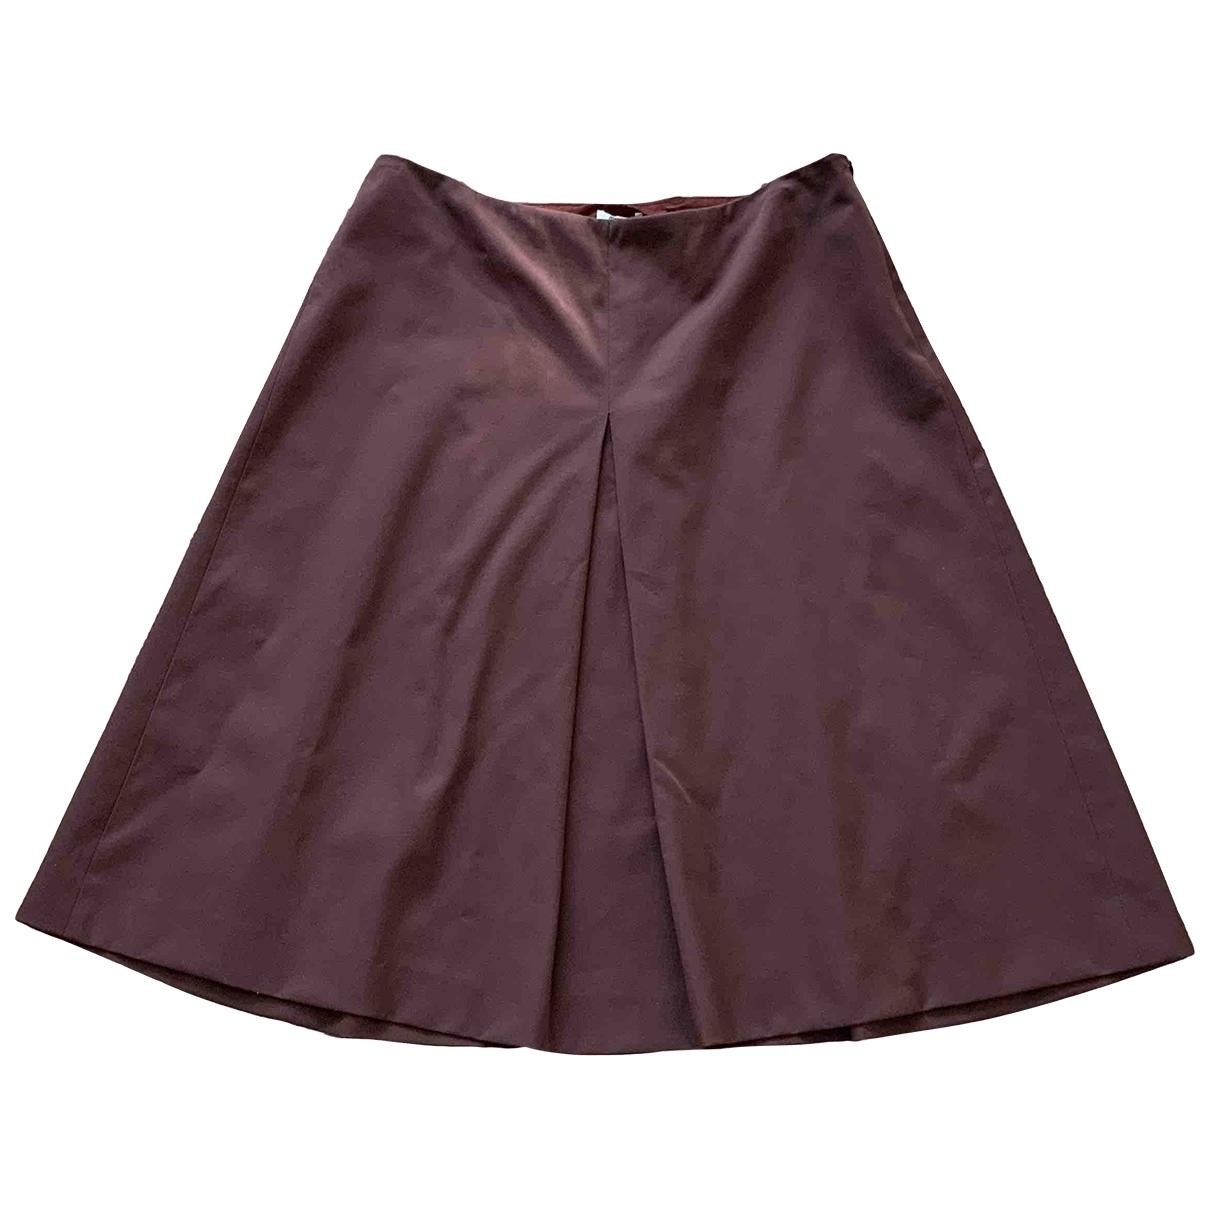 Miu Miu \N Burgundy skirt for Women 40 IT